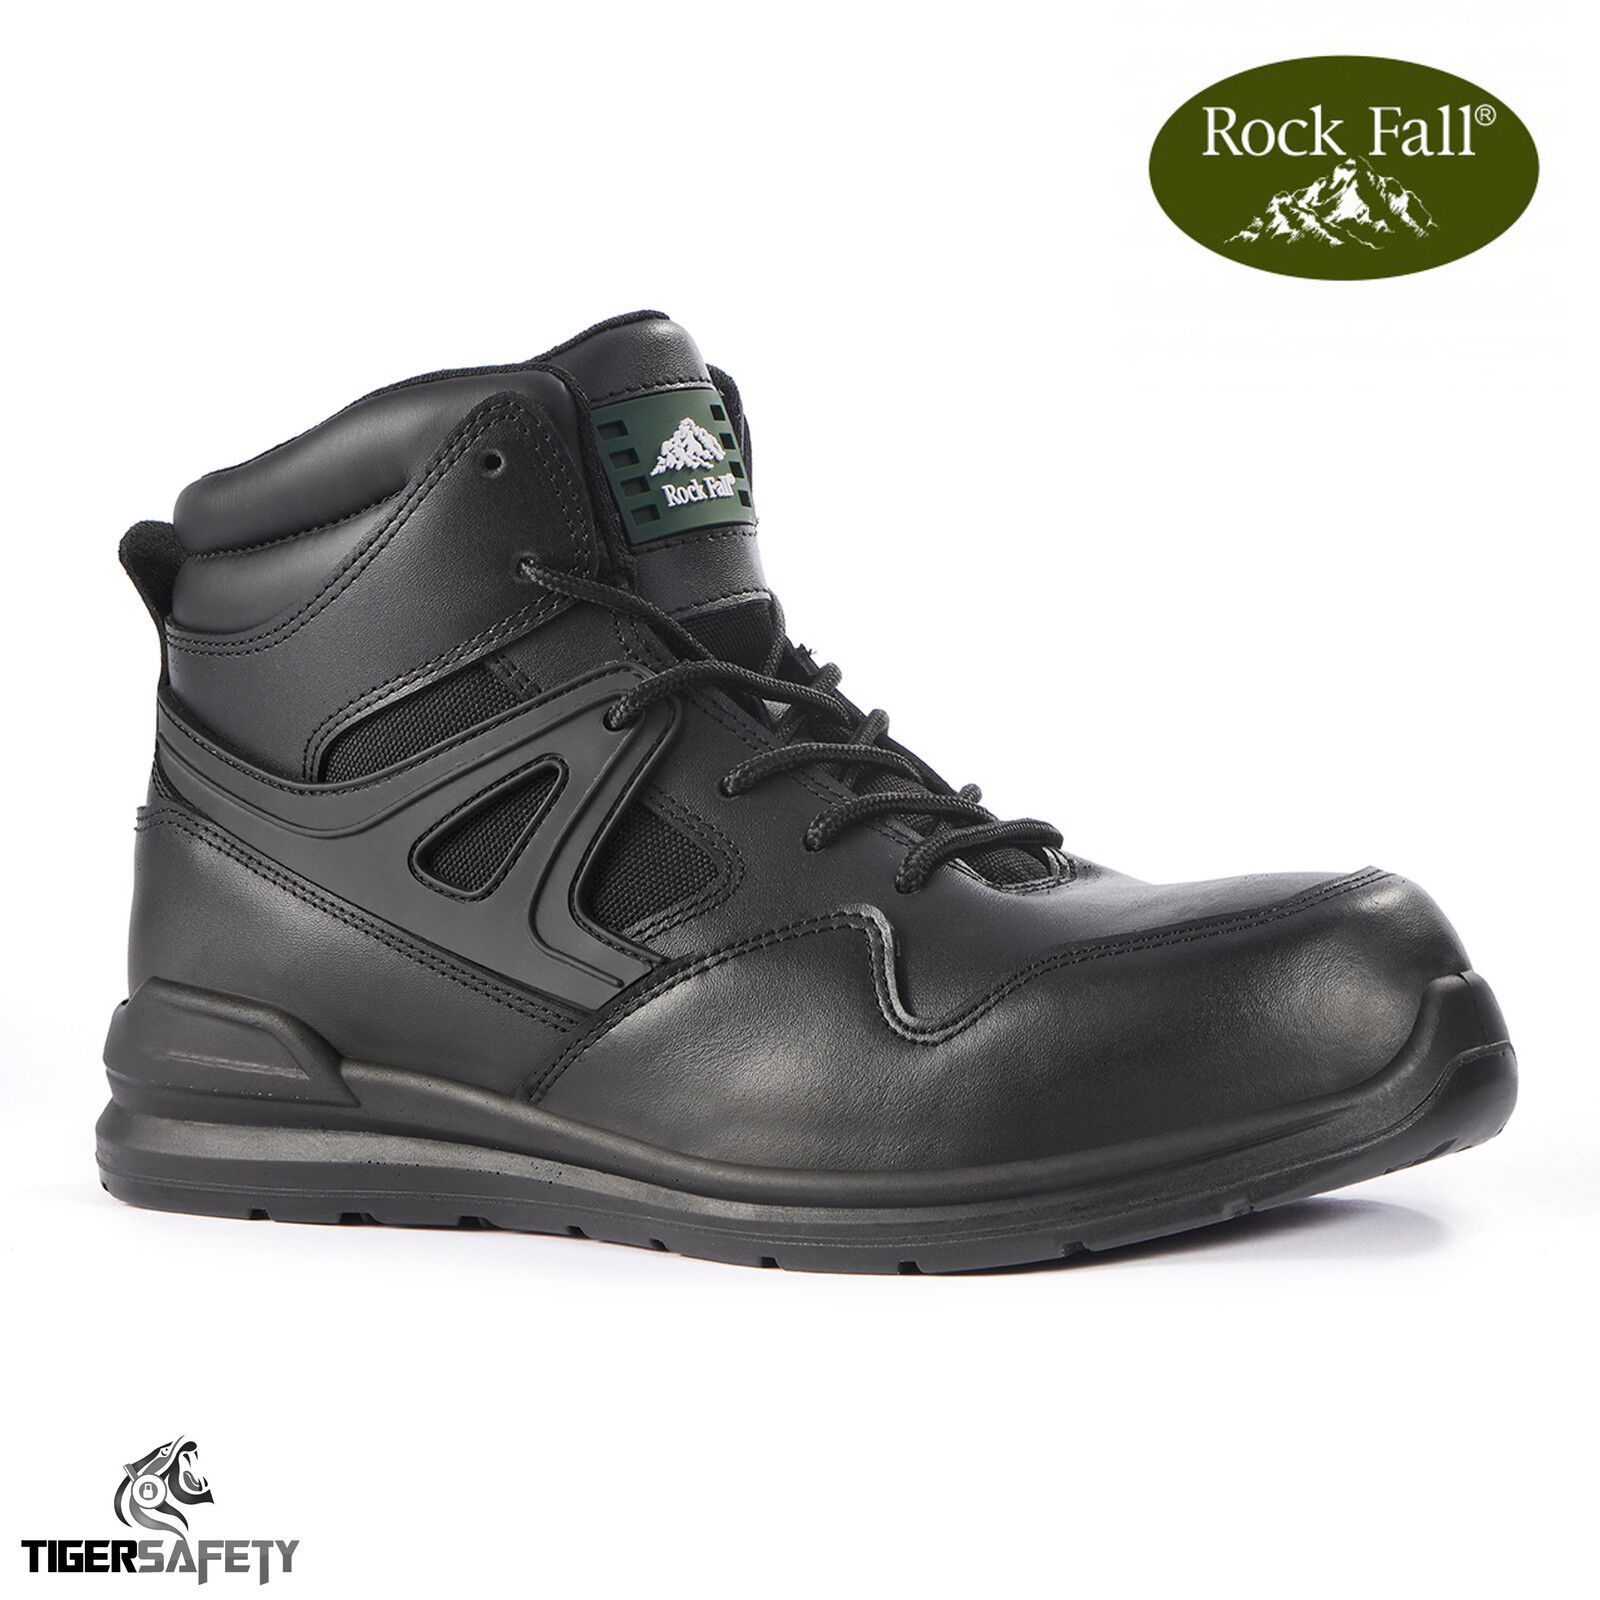 Rock Fall Grafite RF670 S3 SRC LEGGERA NERA 100% non metallici calzature di sicurezza